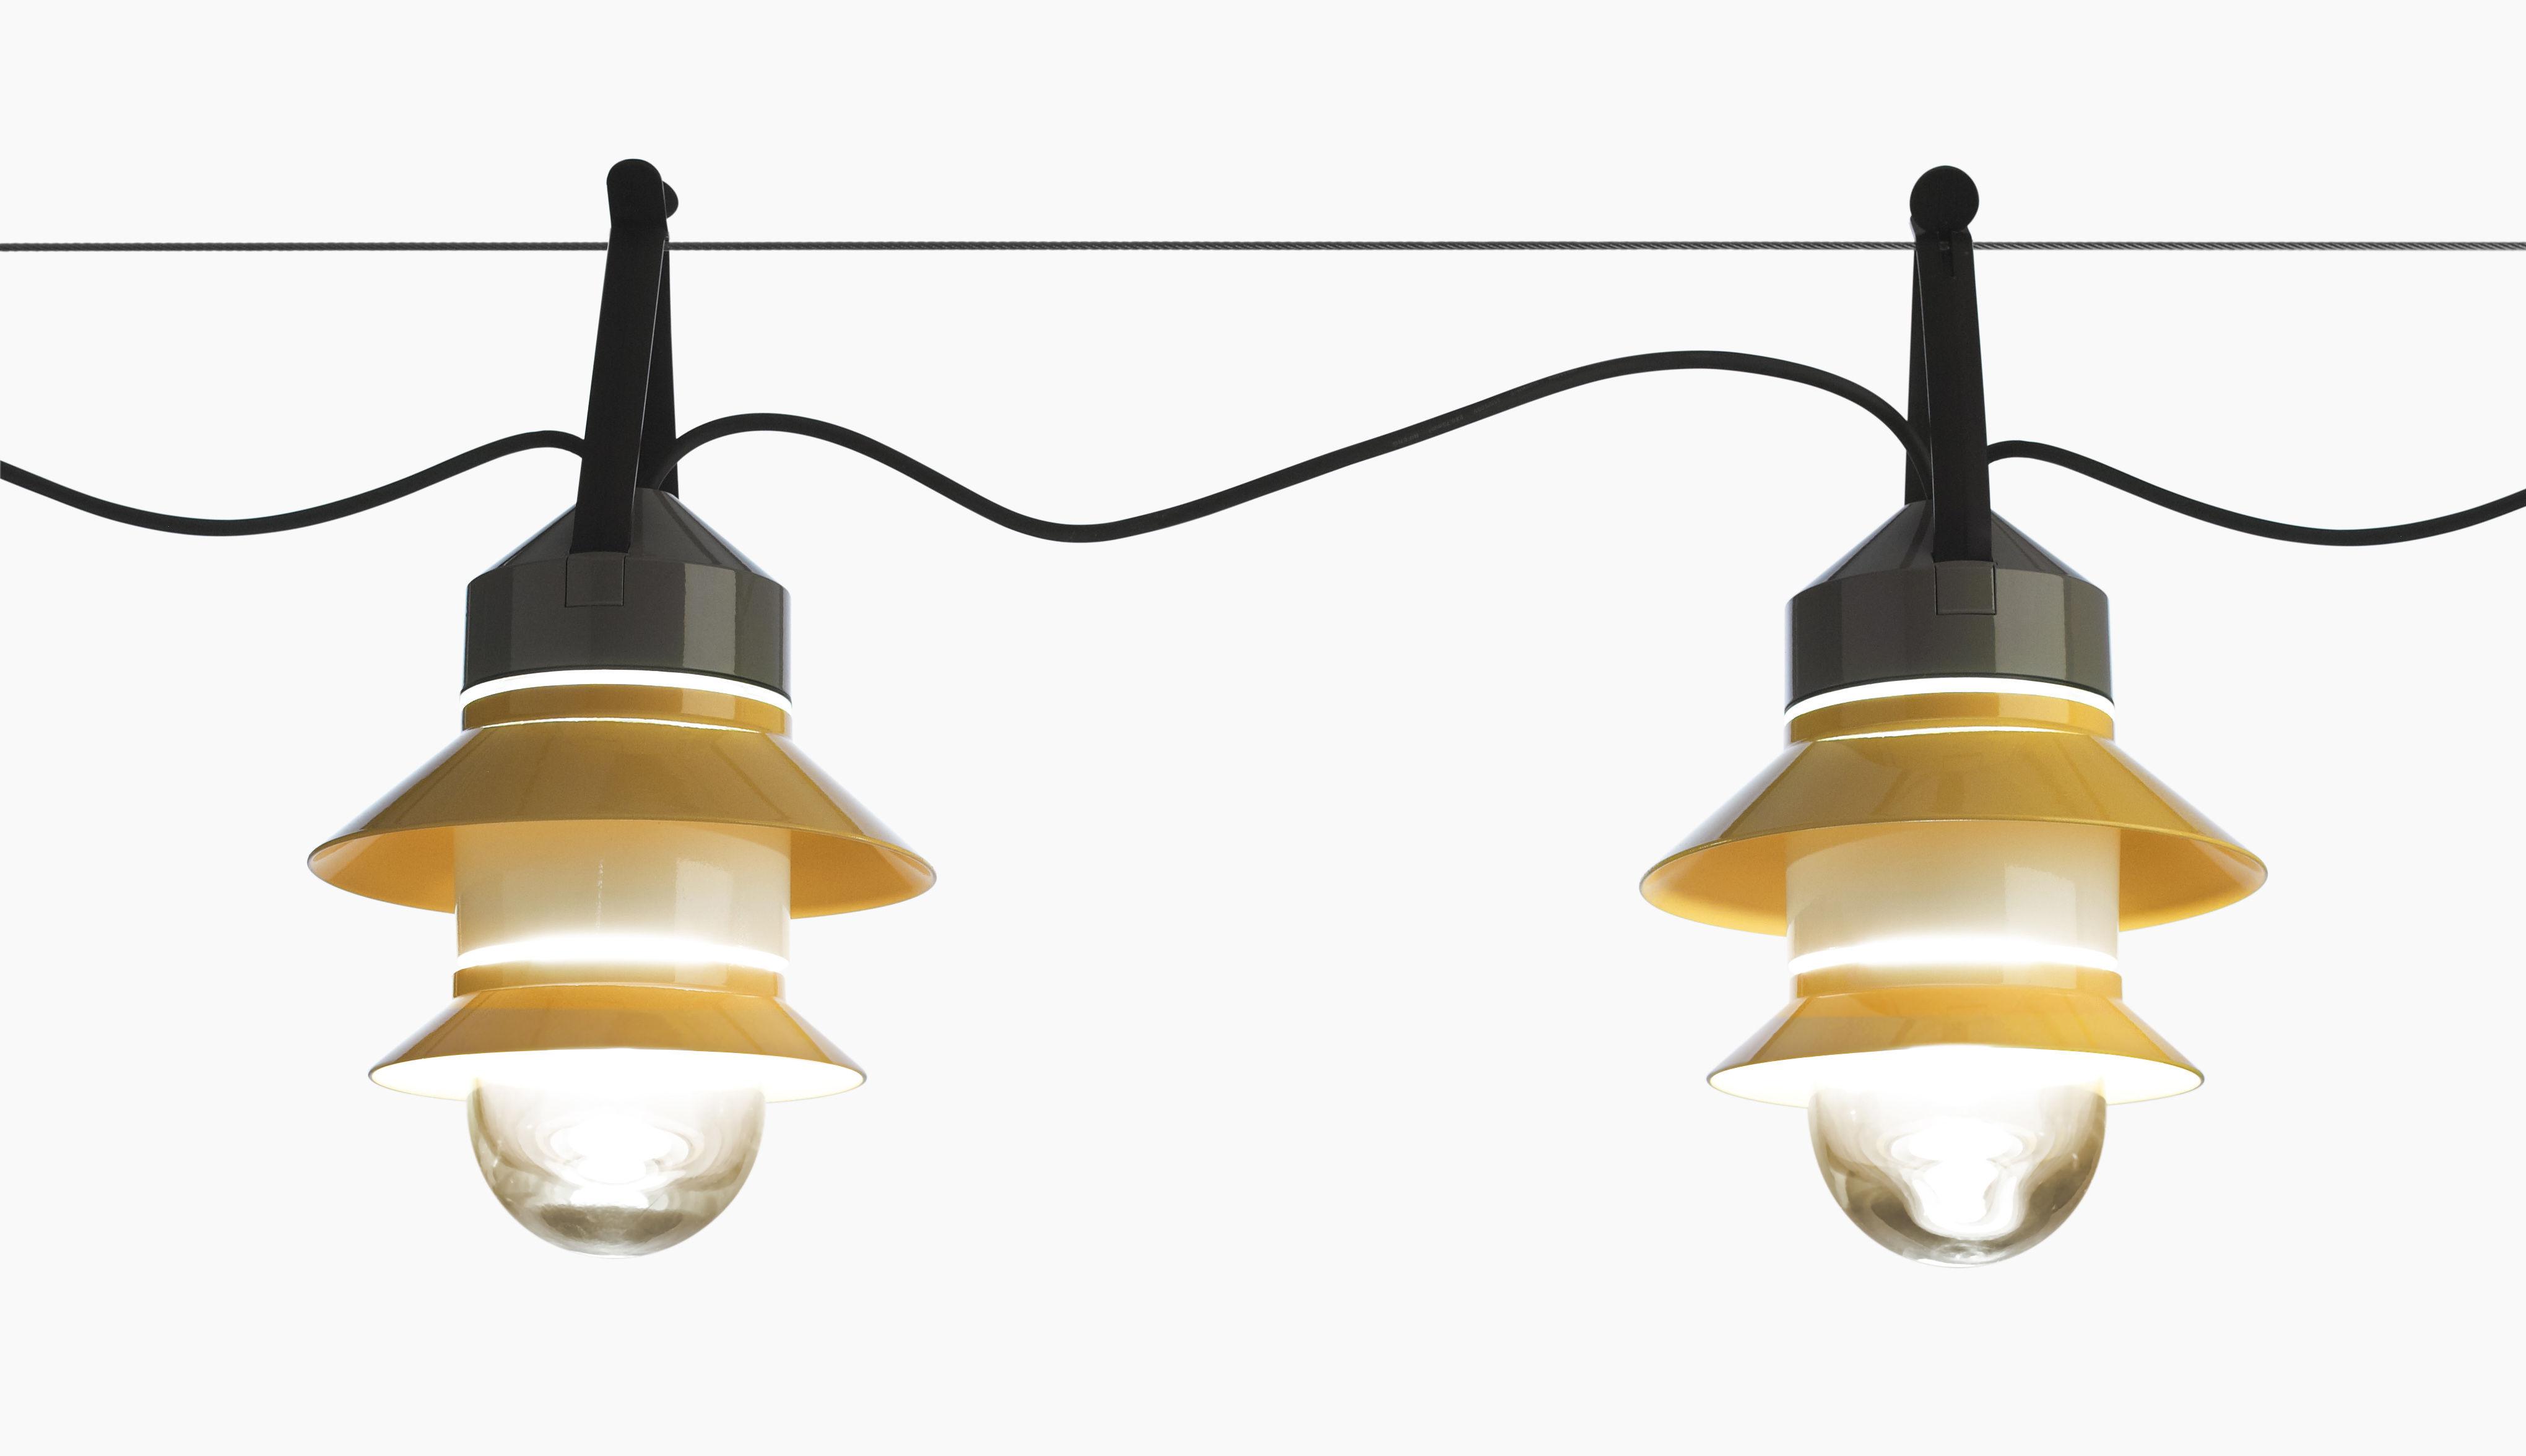 lampe santorini baladeuse suspendre jaune moutarde gris marset. Black Bedroom Furniture Sets. Home Design Ideas